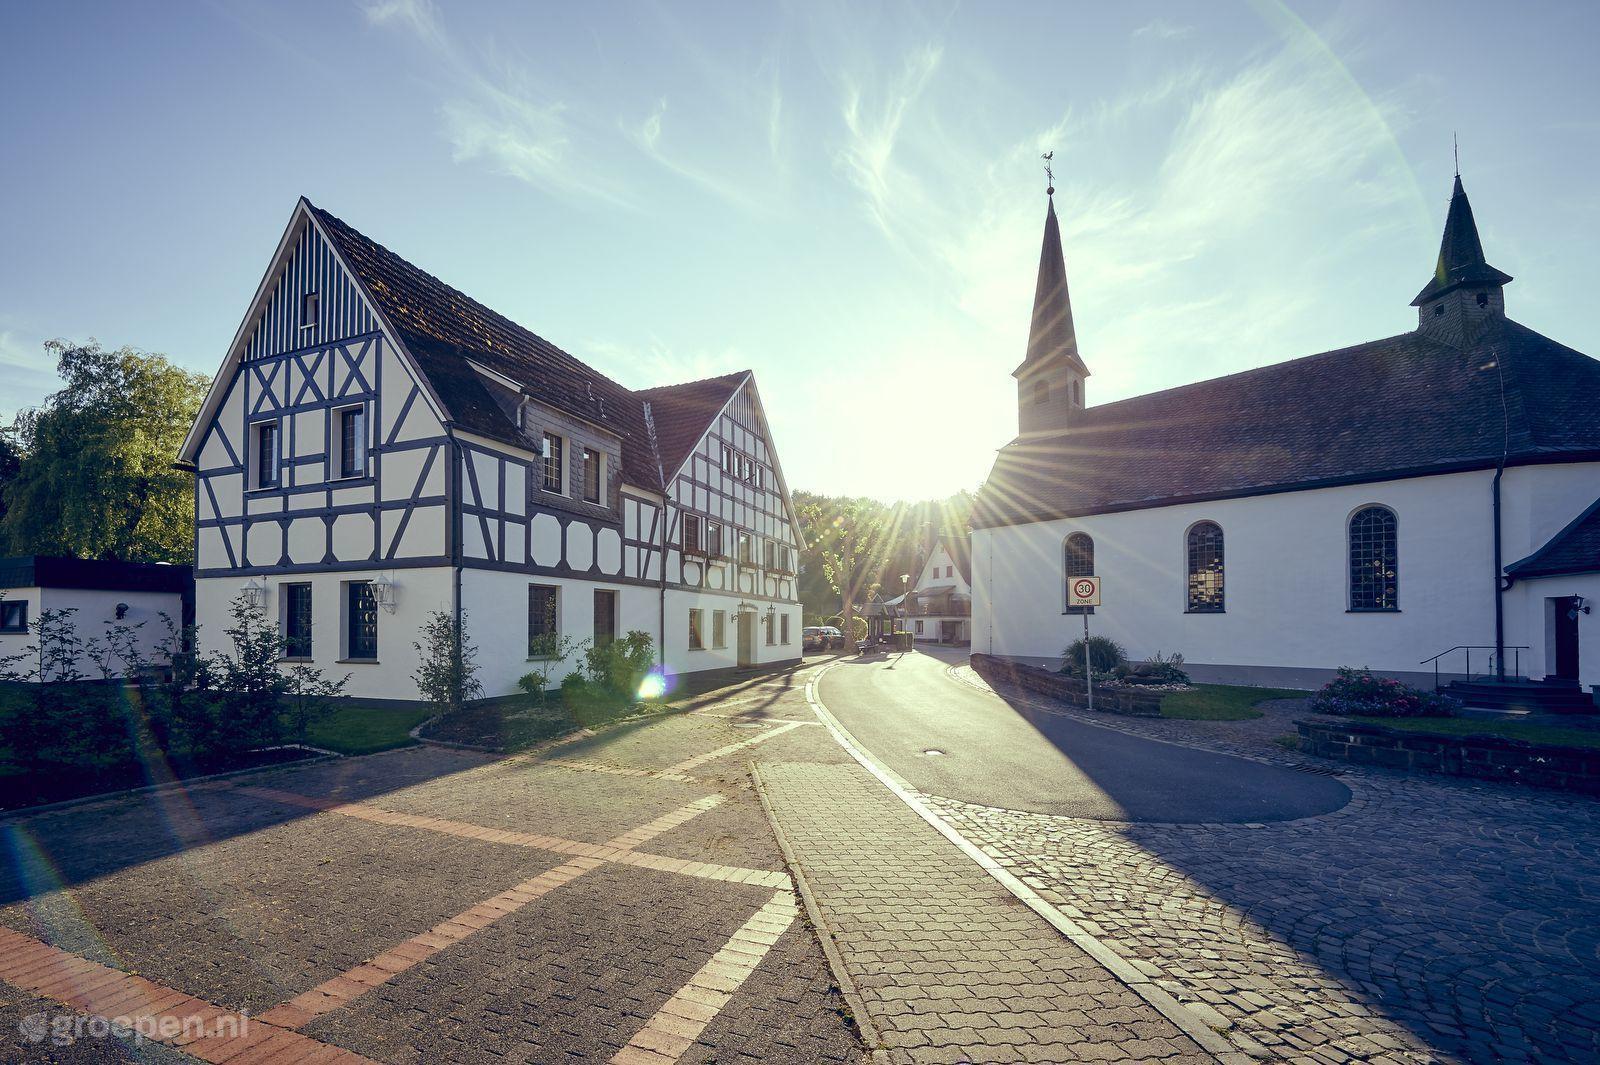 Kückelheim